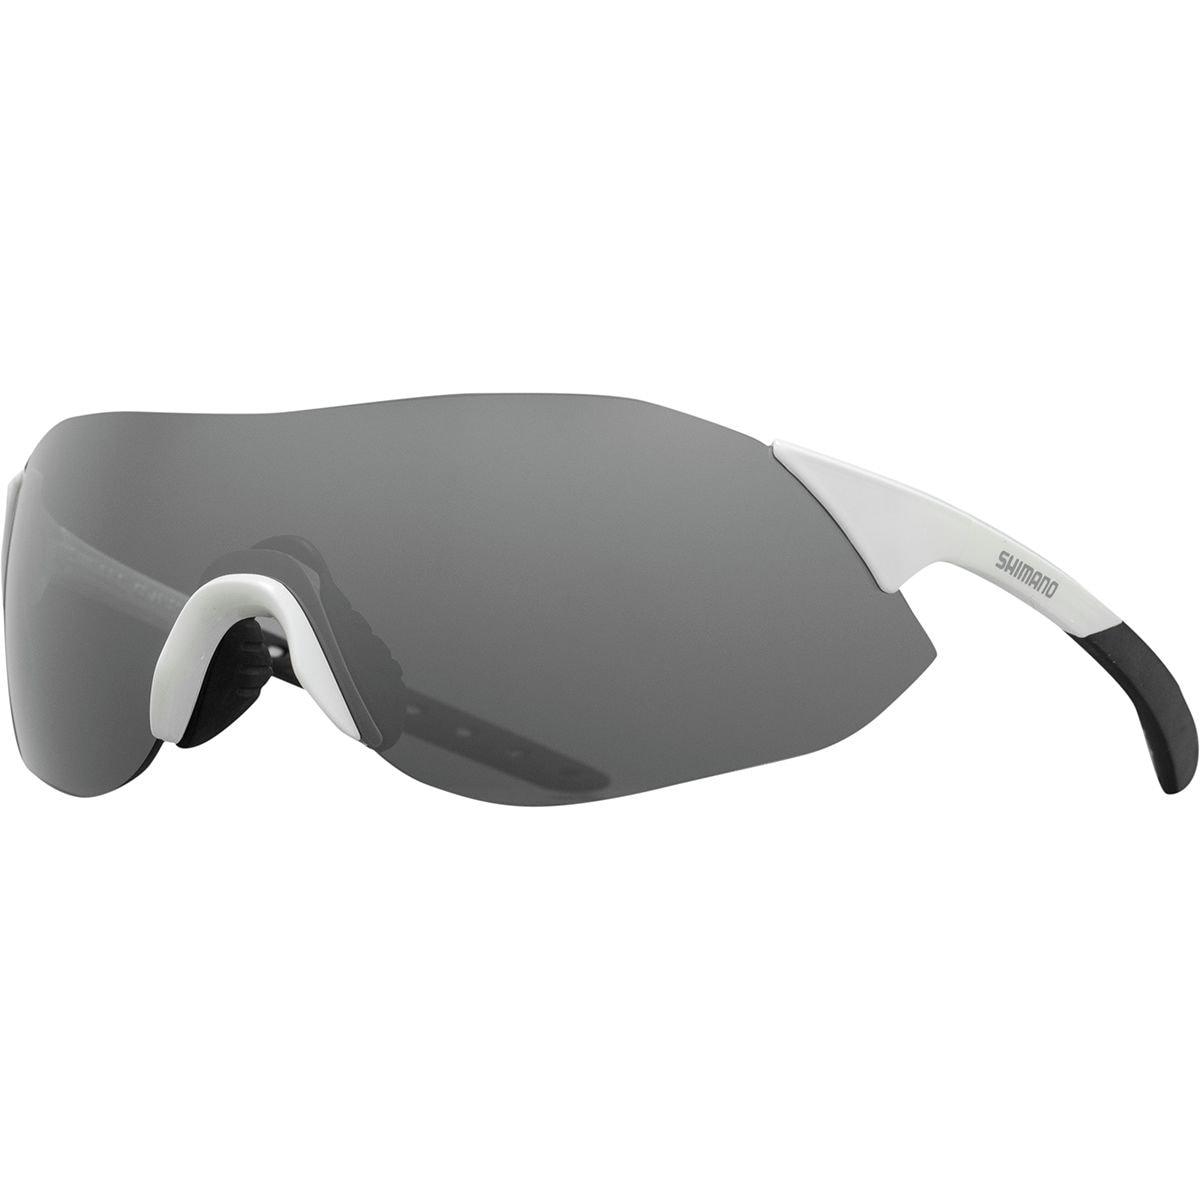 Shimano Aerolite S Cycling Sunglasses - CE-ARLS - Men's